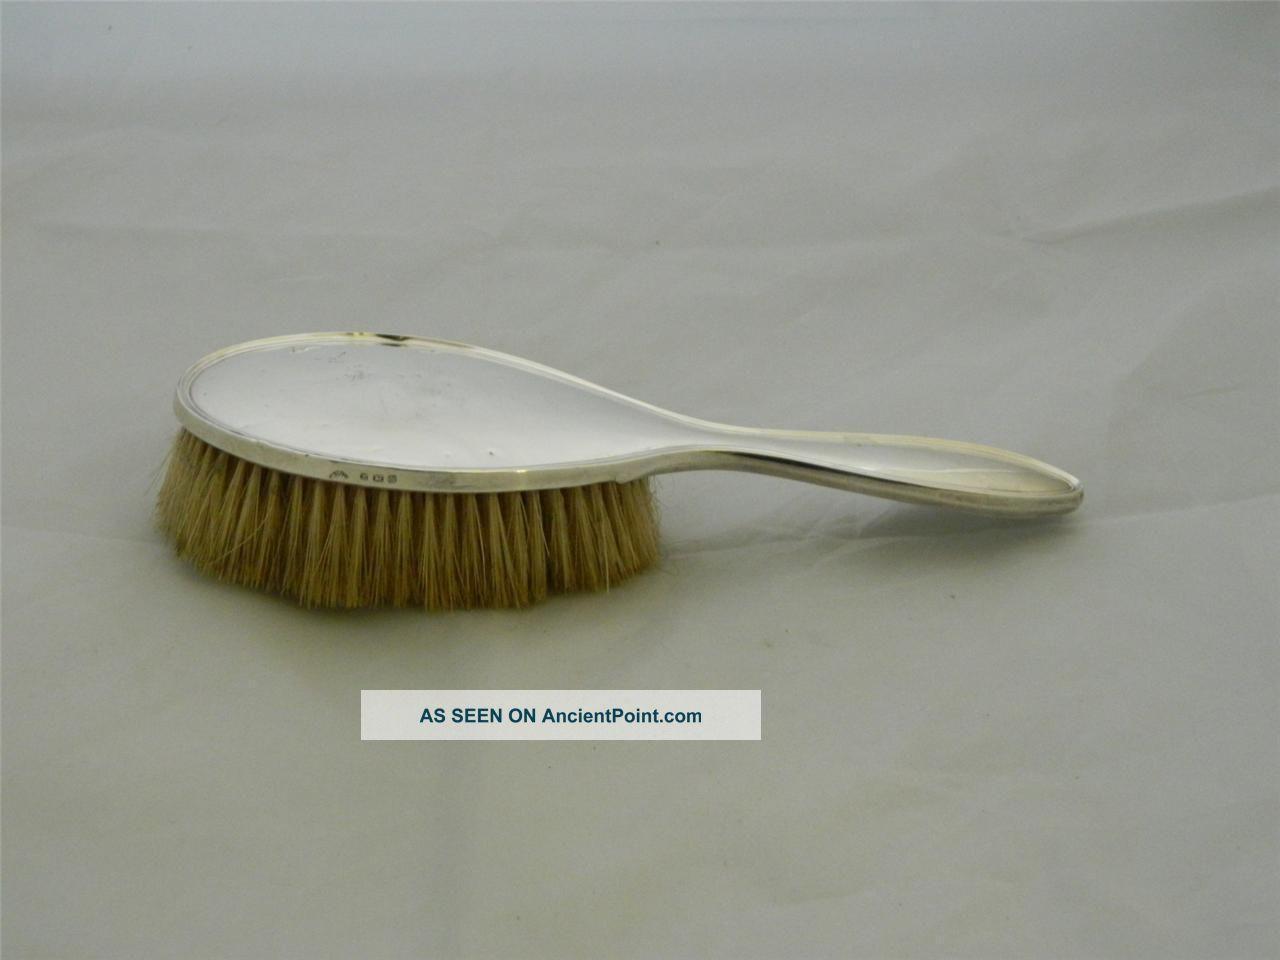 Vintage Solid Silver Hand Brush Hallmarked 1922 By Bros Ltd Mirrors photo